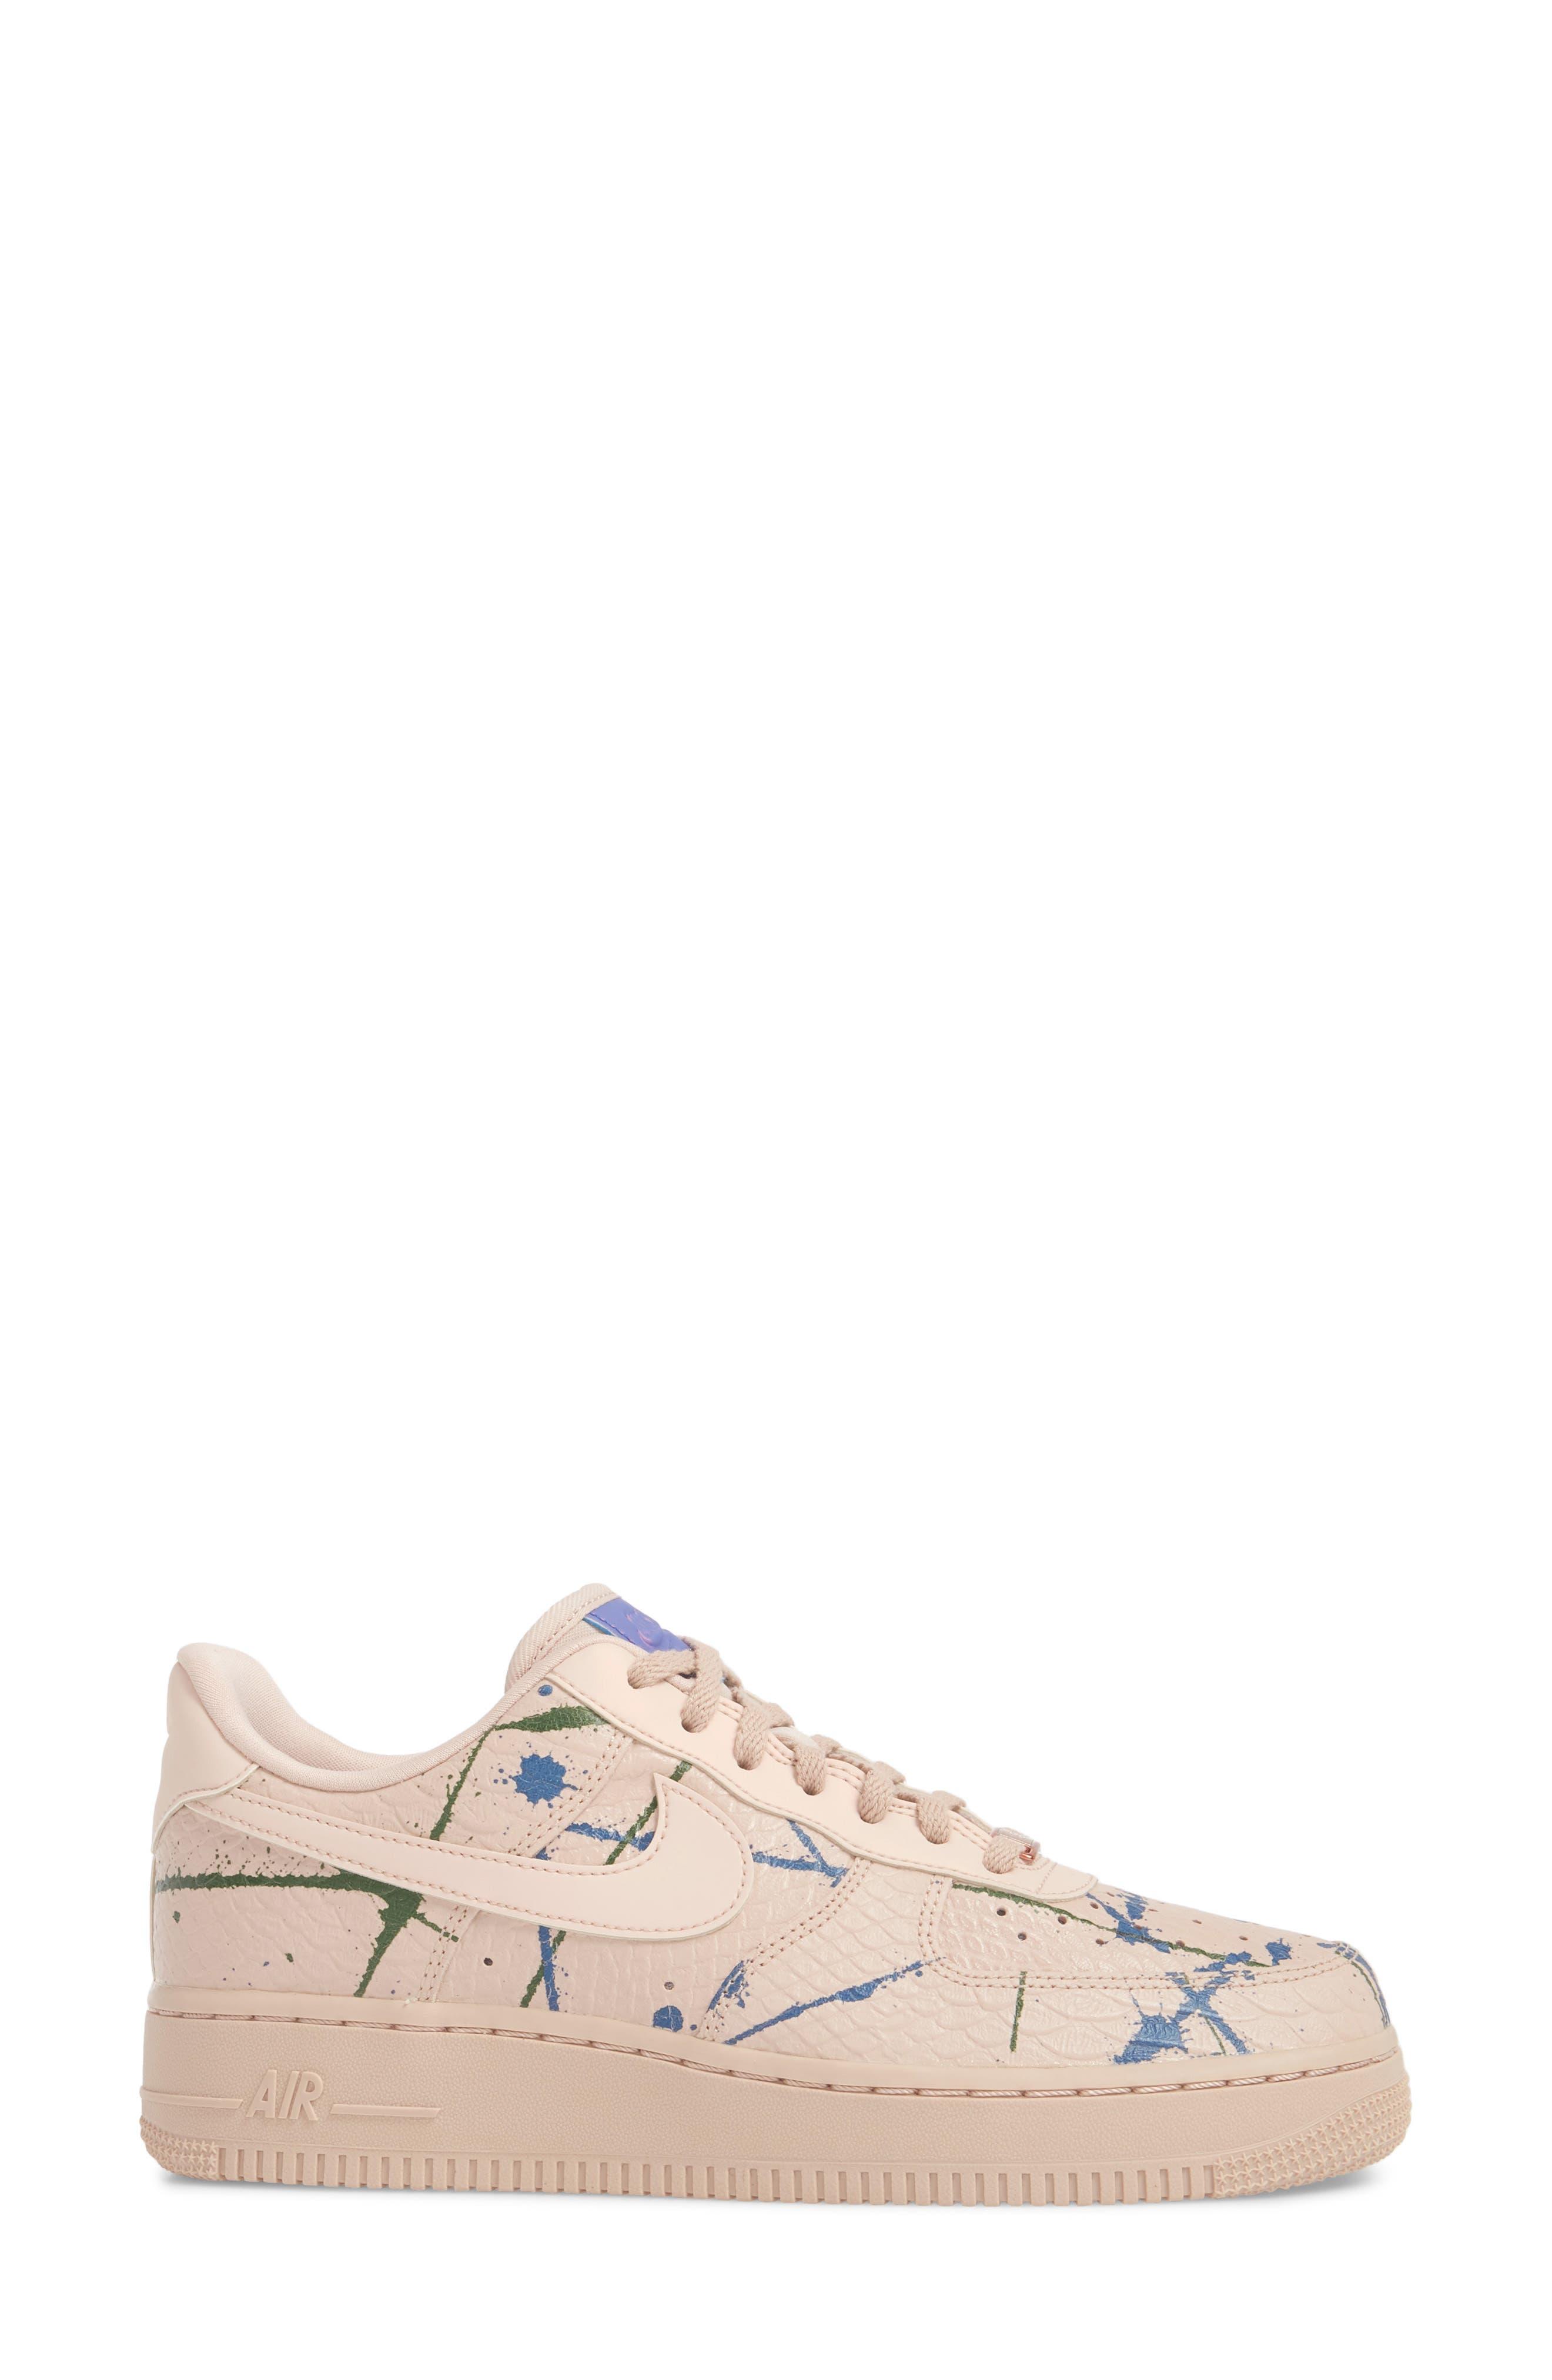 Air Force 1 '07 LX Sneaker,                             Alternate thumbnail 3, color,                             Particle Beige